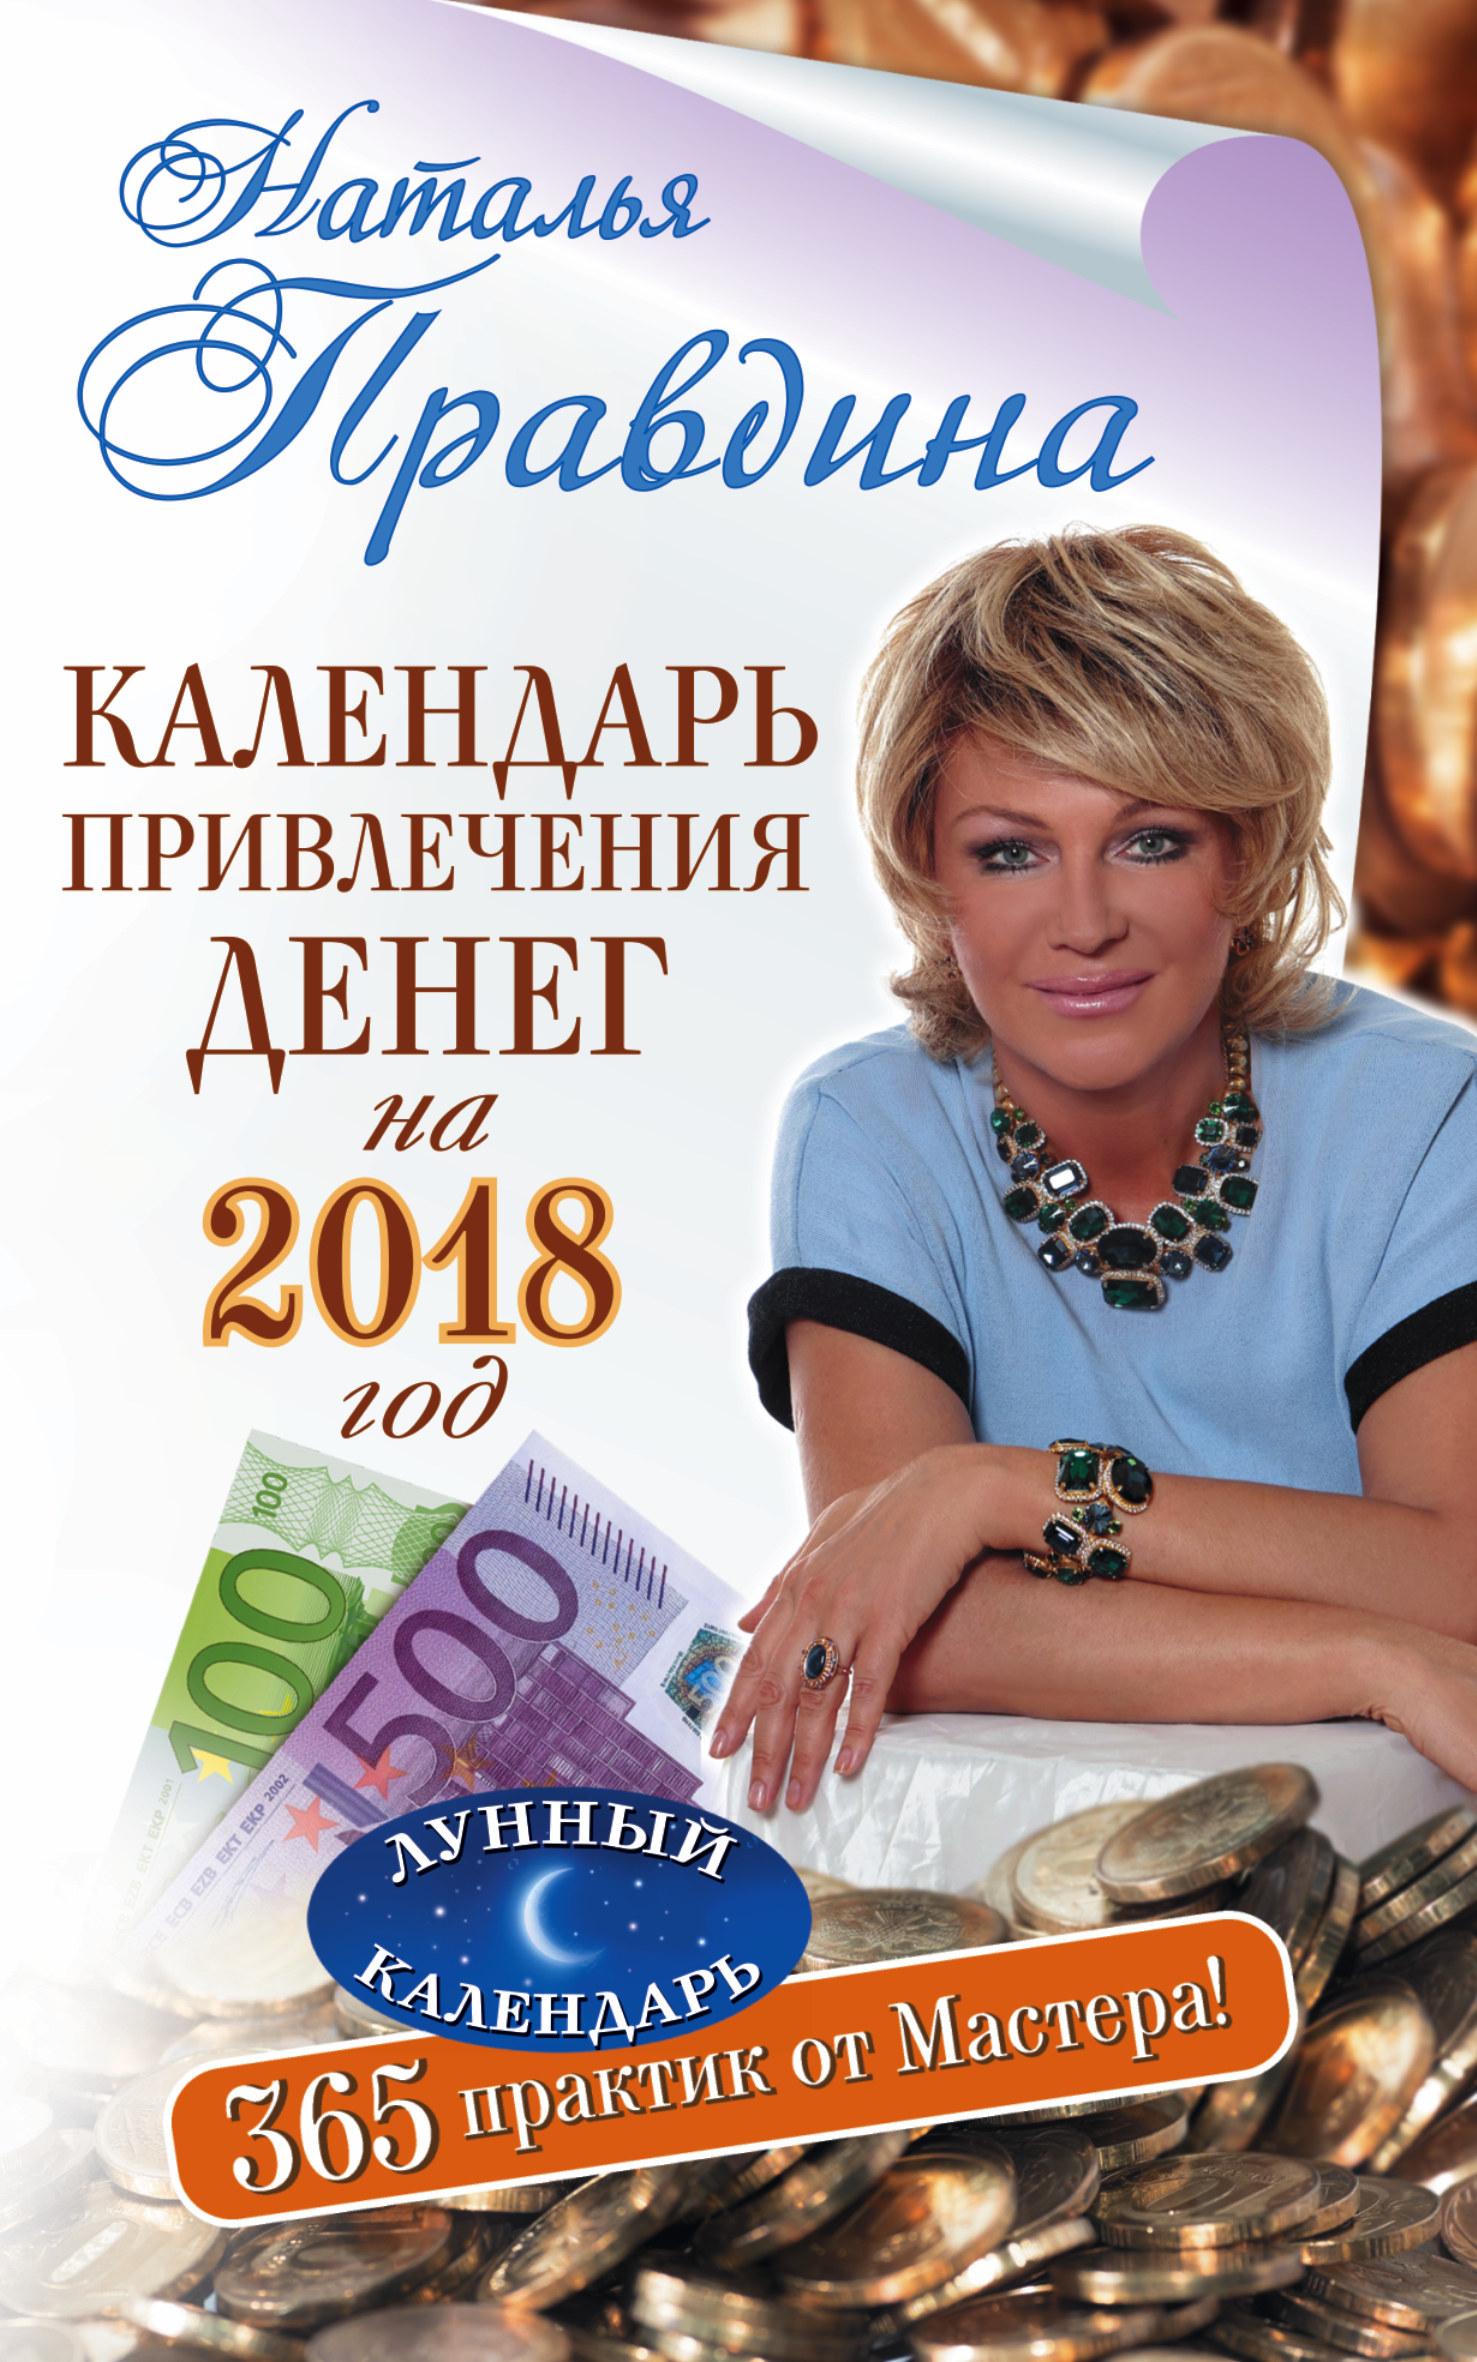 Правдина Н.Б. Календарь привлечения денег на 2018 год. 365 практик от Мастера. Лунный календарь